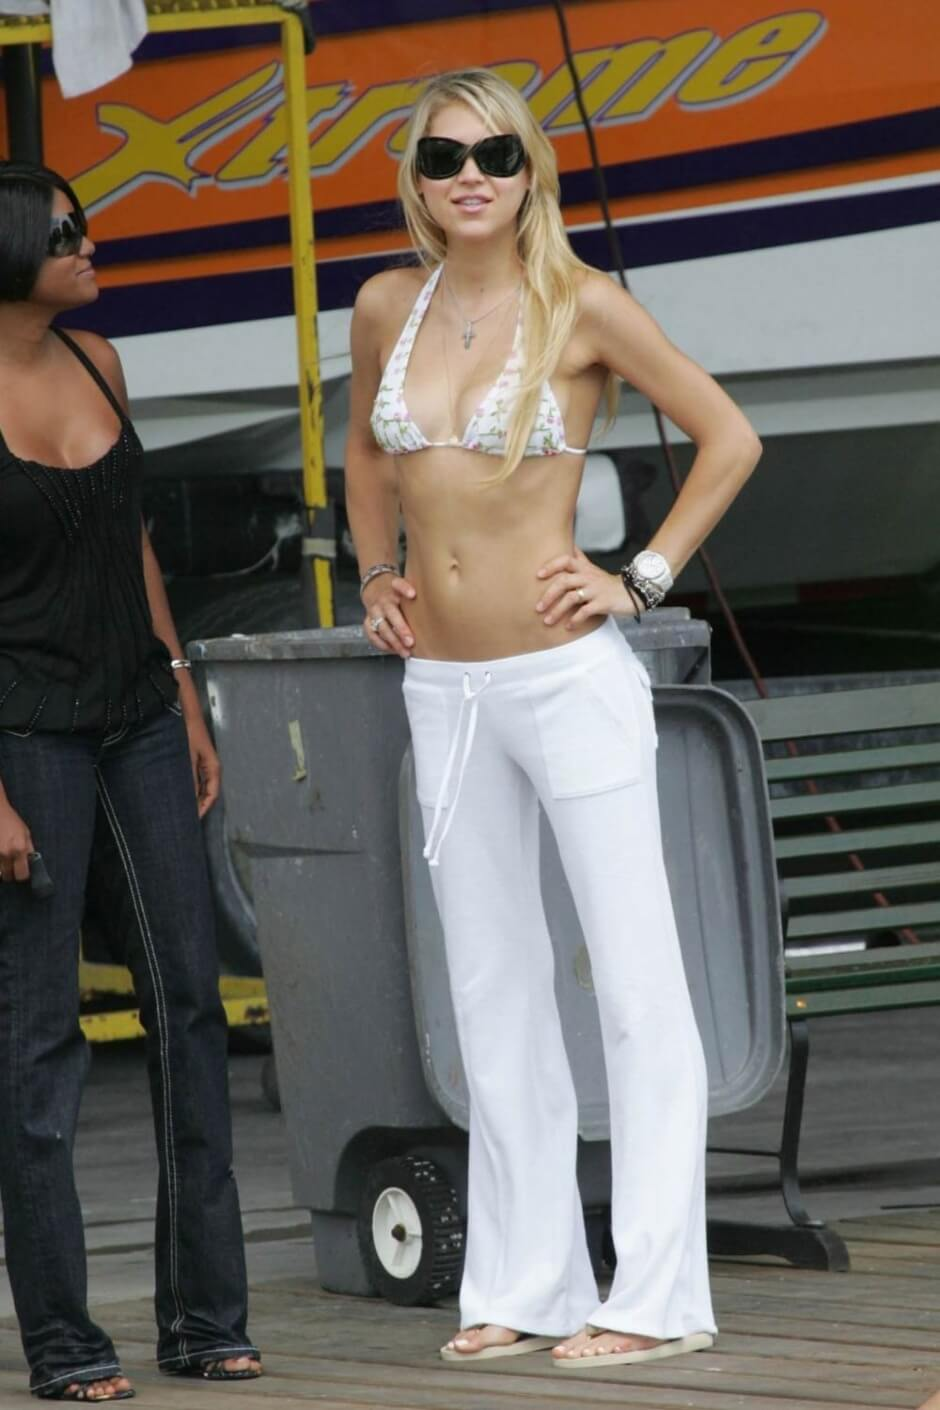 american-tennis-player-Anna-Kournikova-in-bikini-bra-flaunts-her-sexy-physique